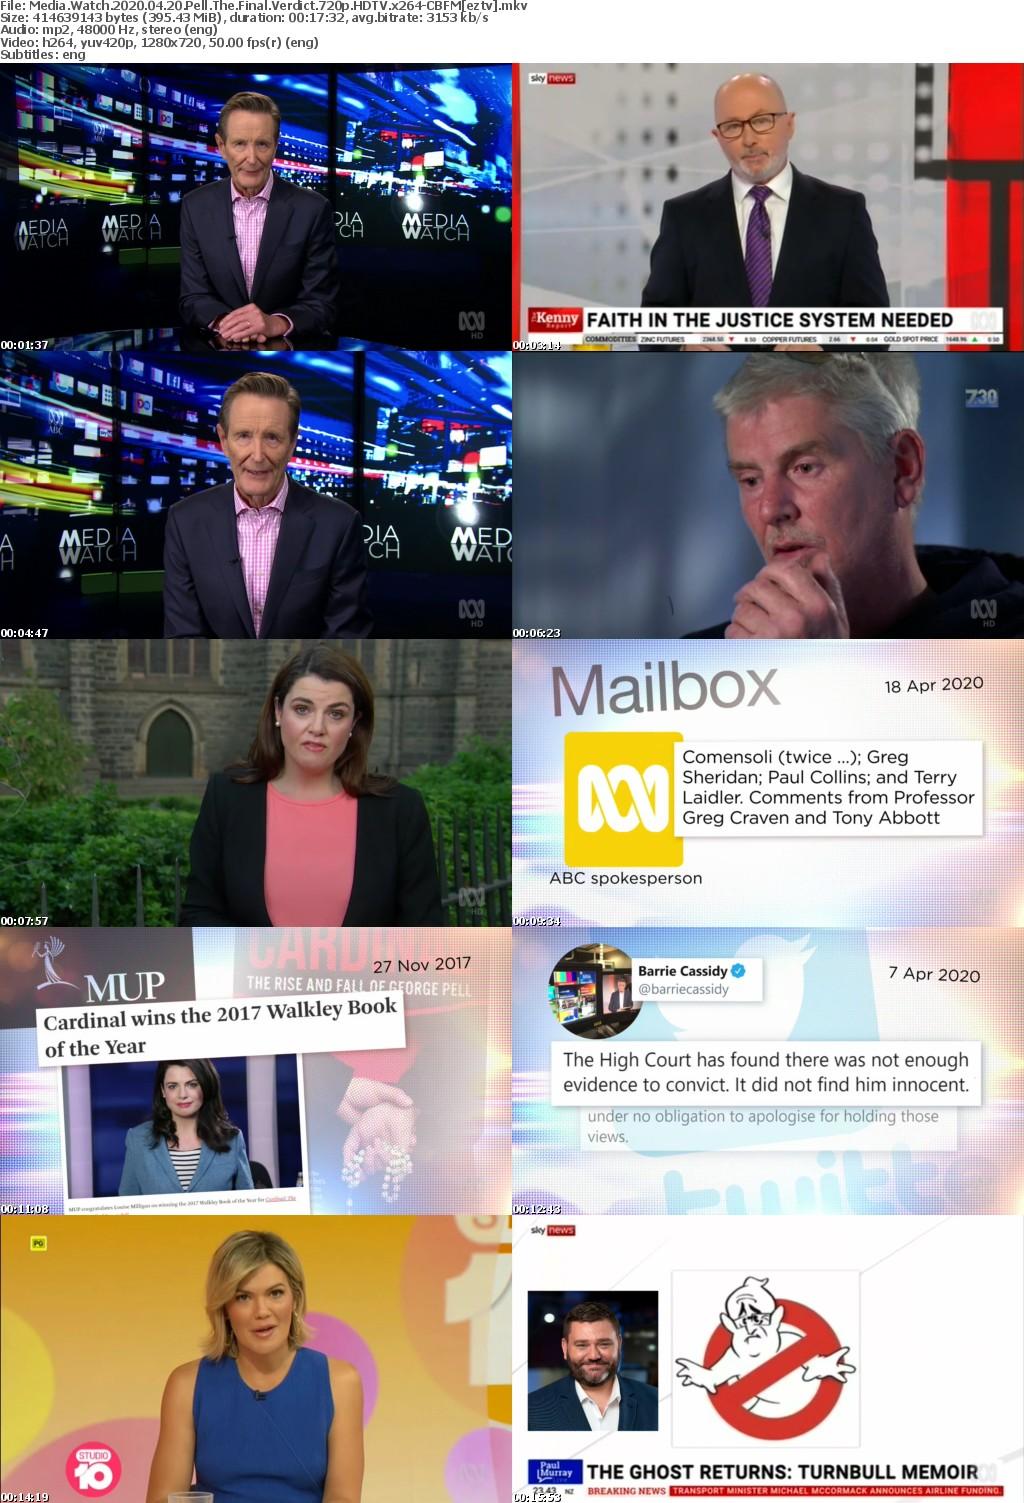 Media Watch 2020 04 20 Pell The Final Verdict 720p HDTV x264-CBFM